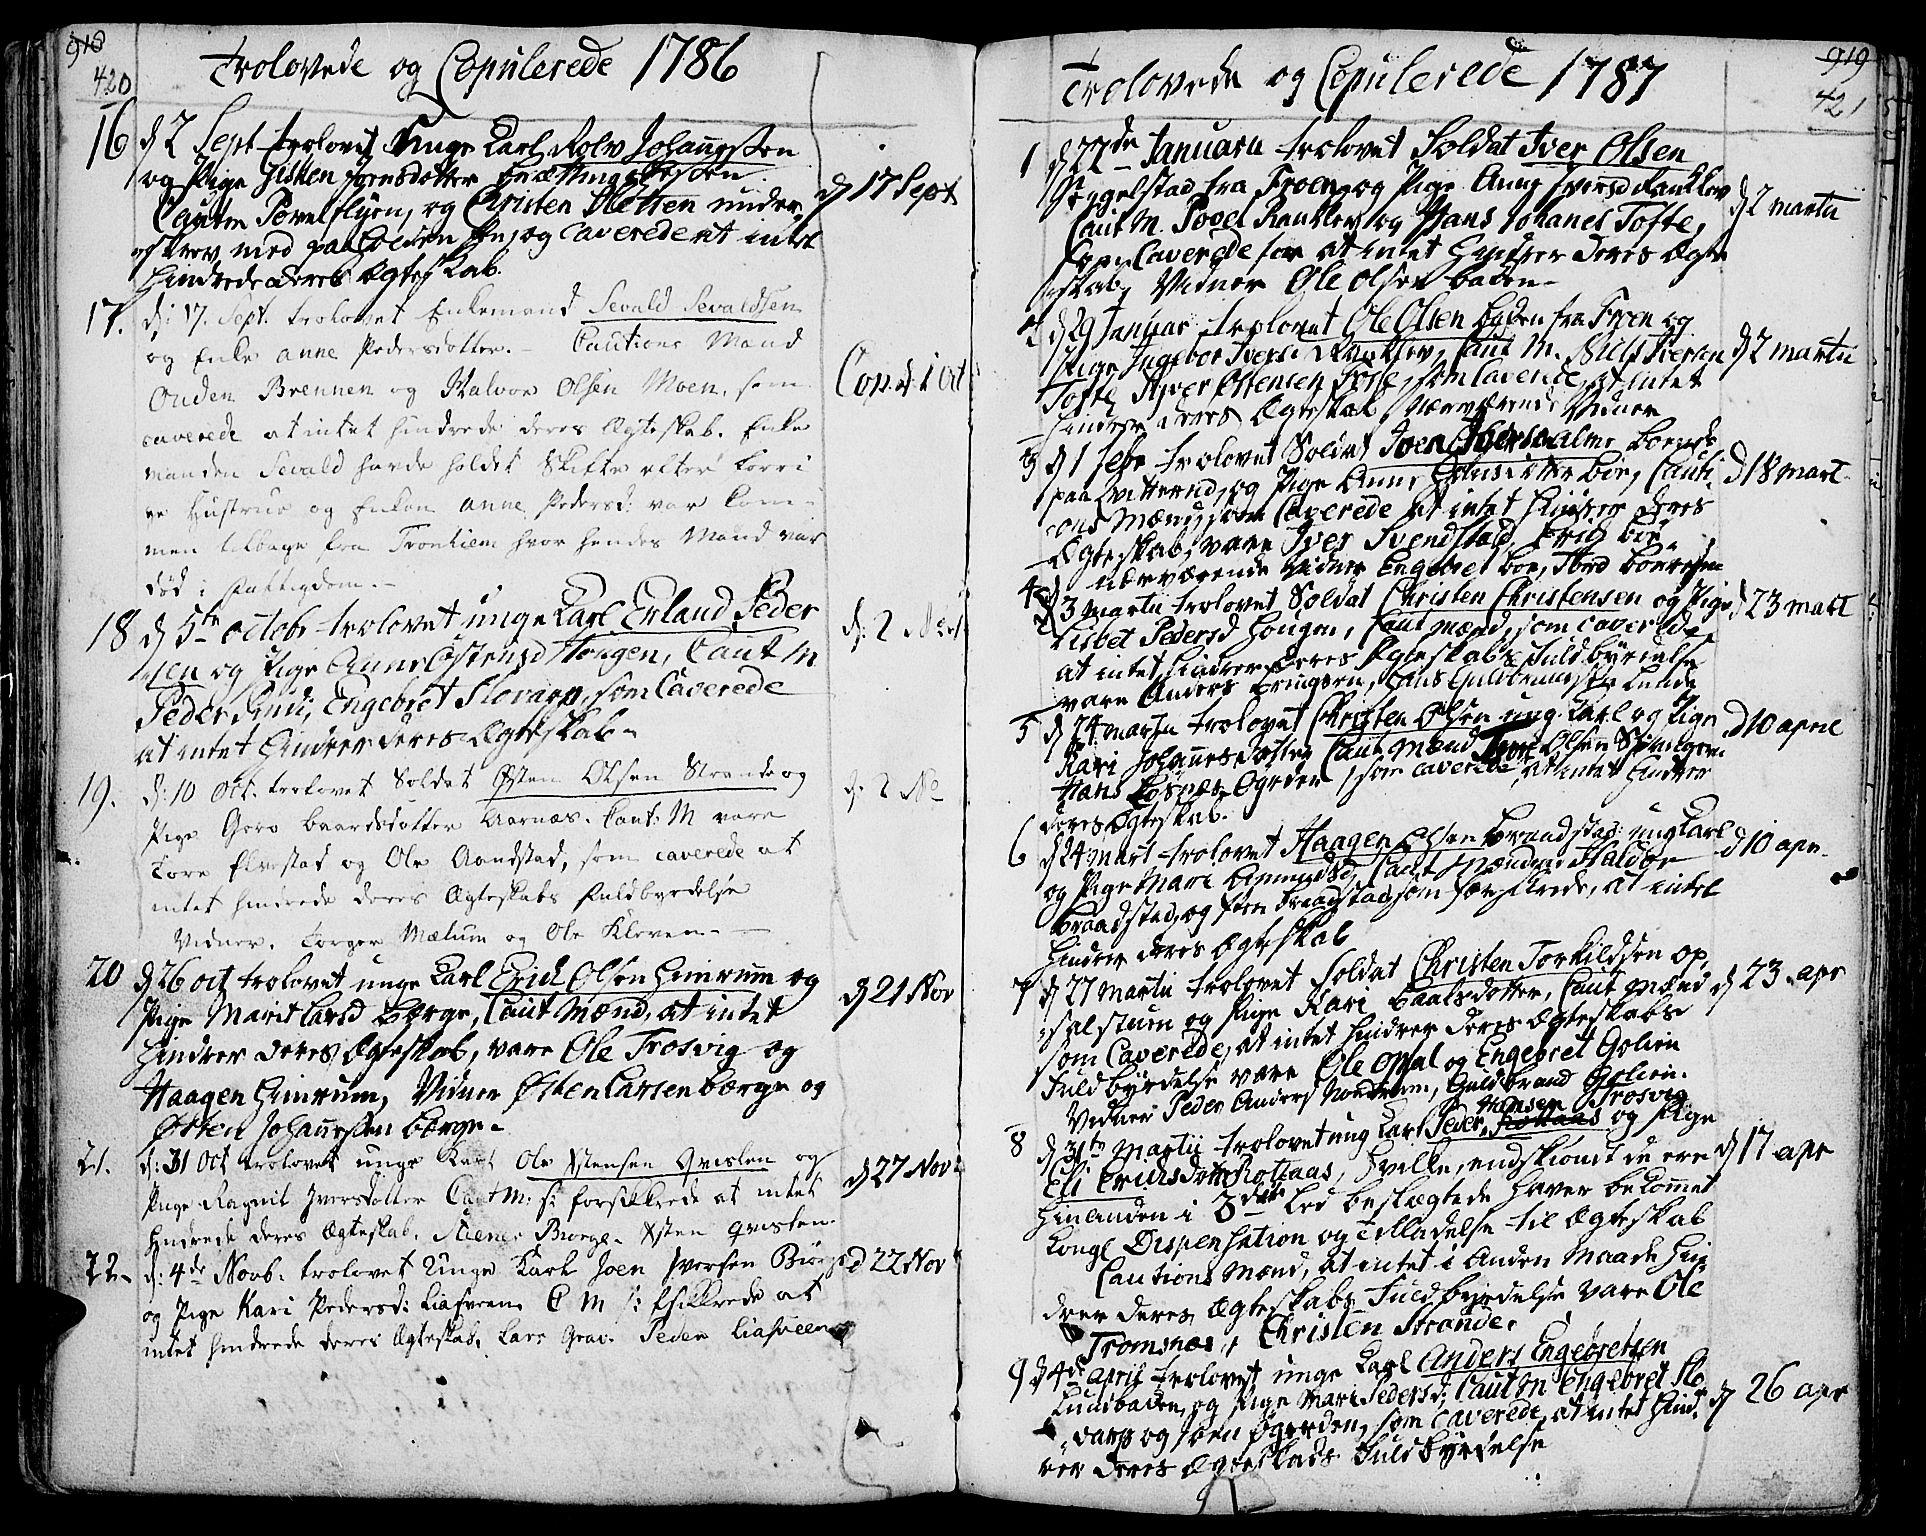 SAH, Ringebu prestekontor, Ministerialbok nr. 3, 1781-1820, s. 420-421